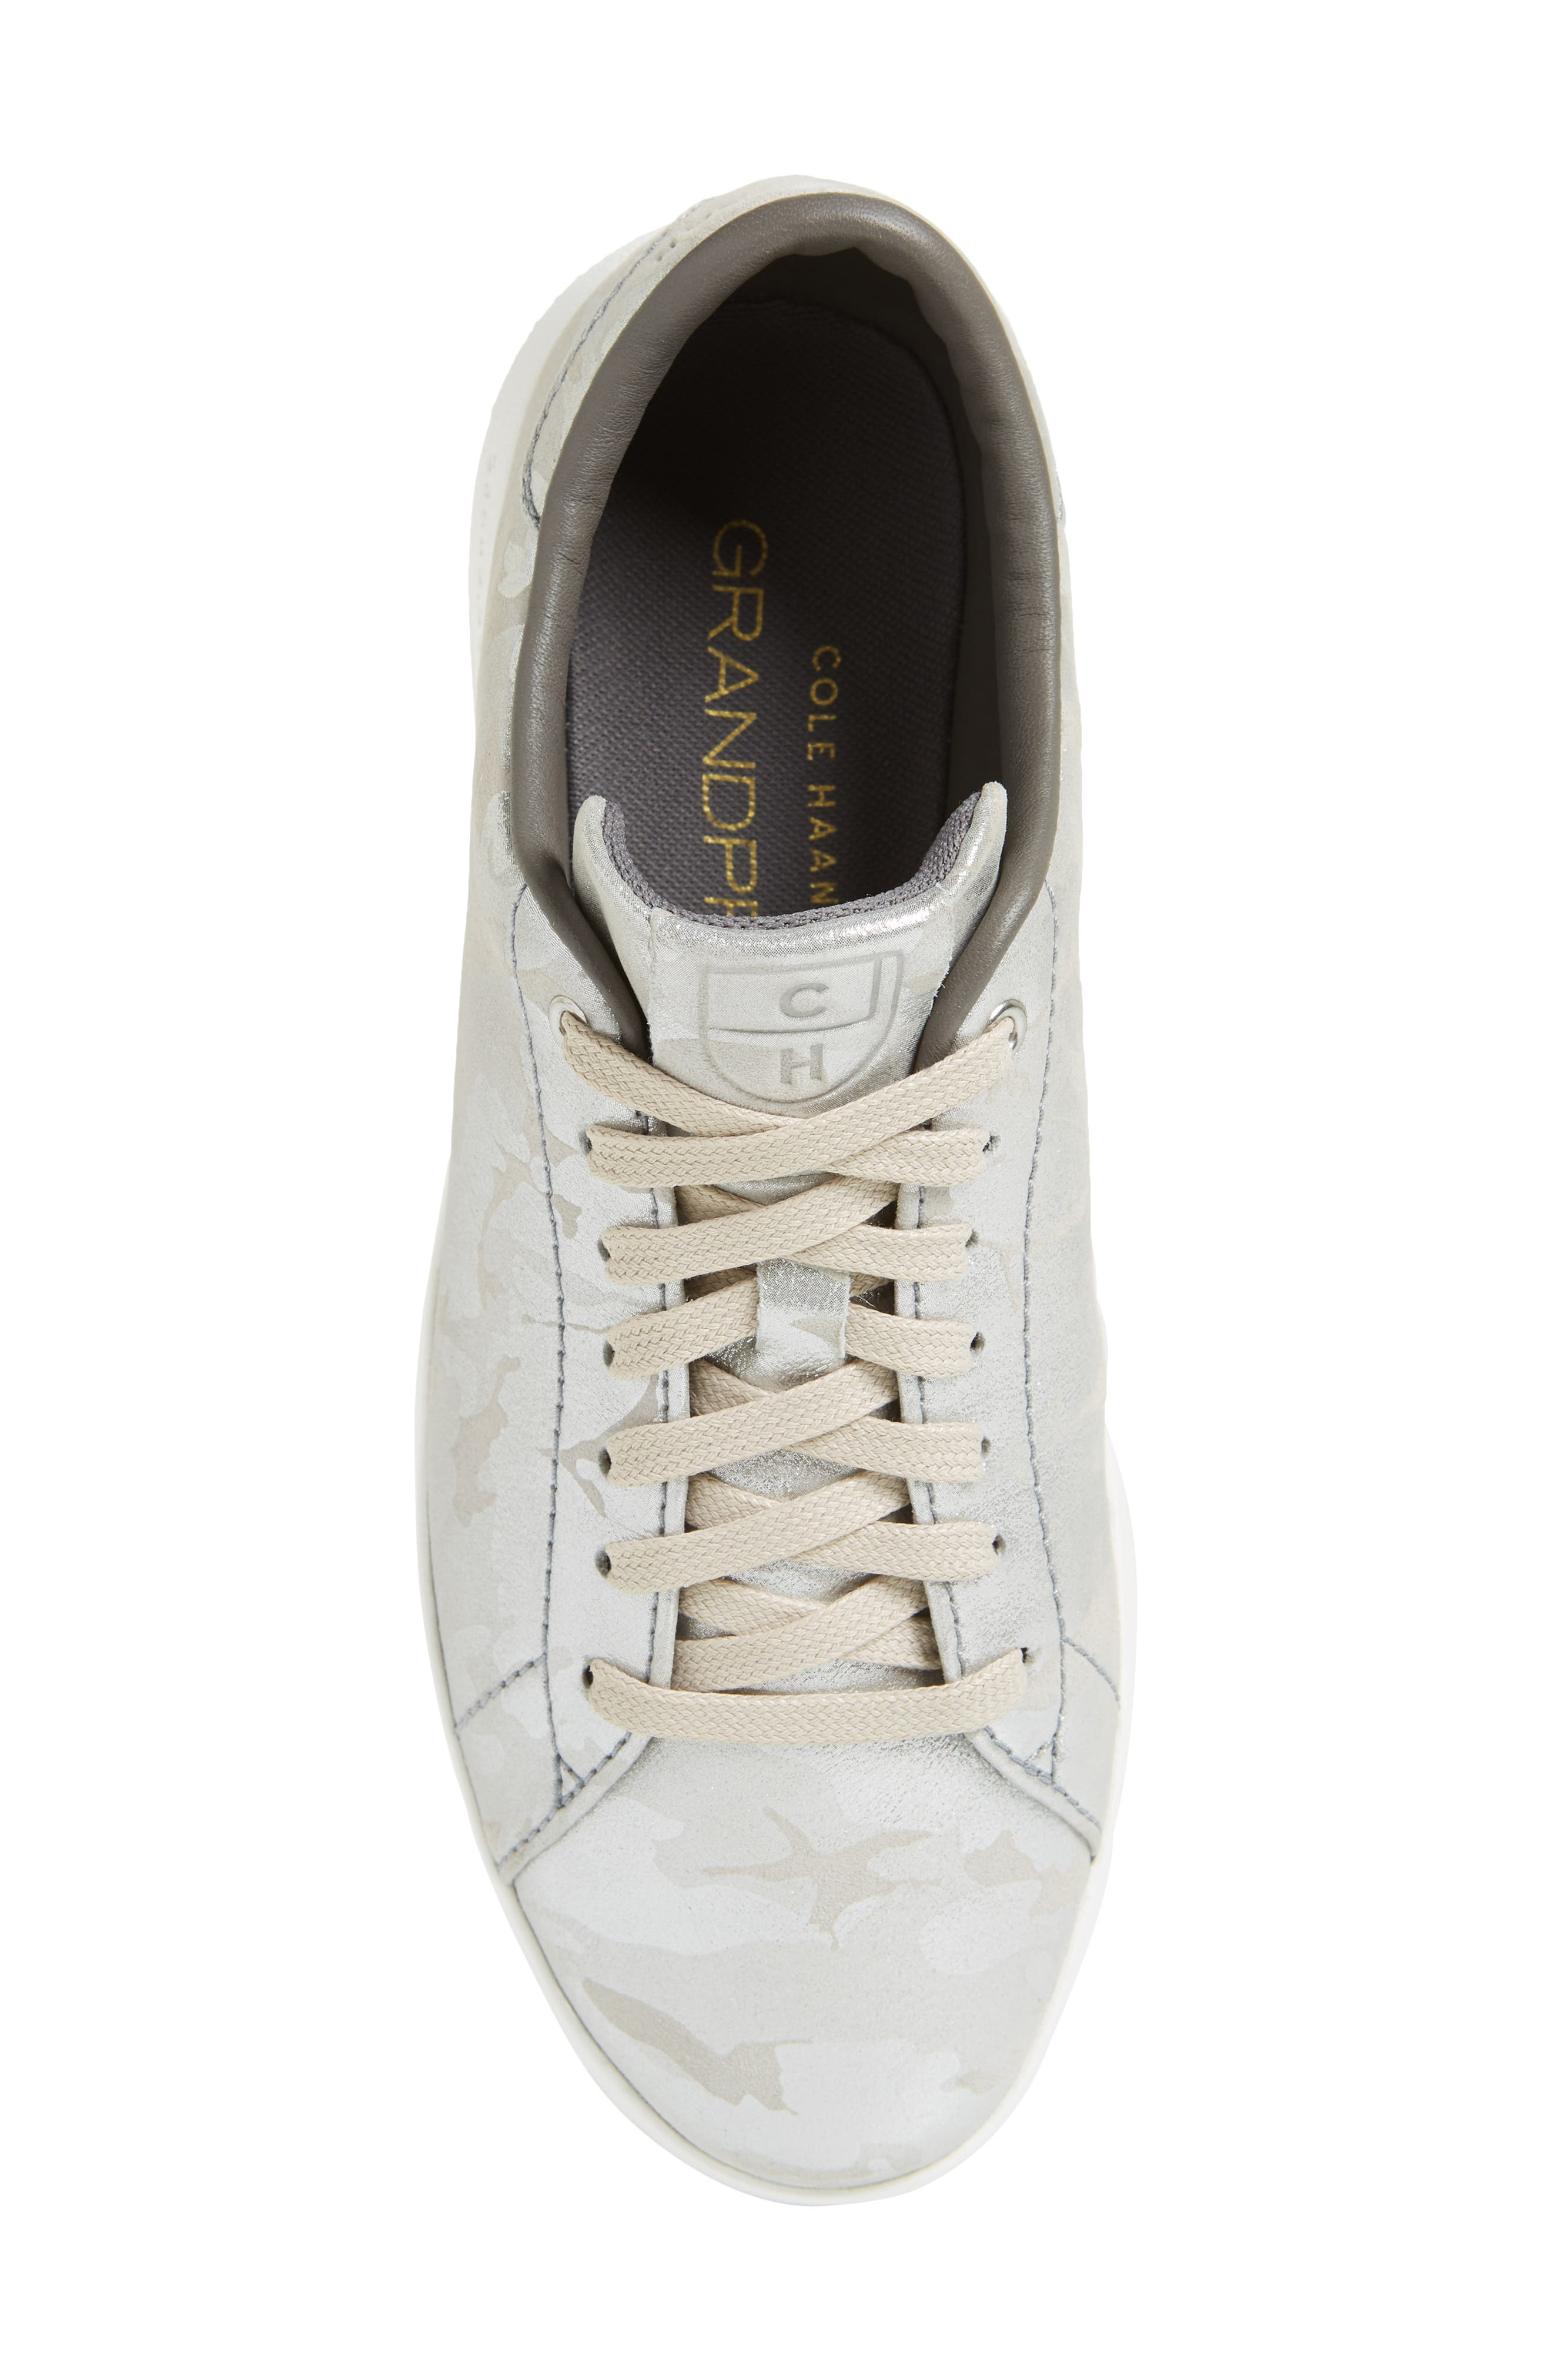 GrandPro Tennis Shoe,                             Alternate thumbnail 5, color,                             Dove Metallic Camo Leather